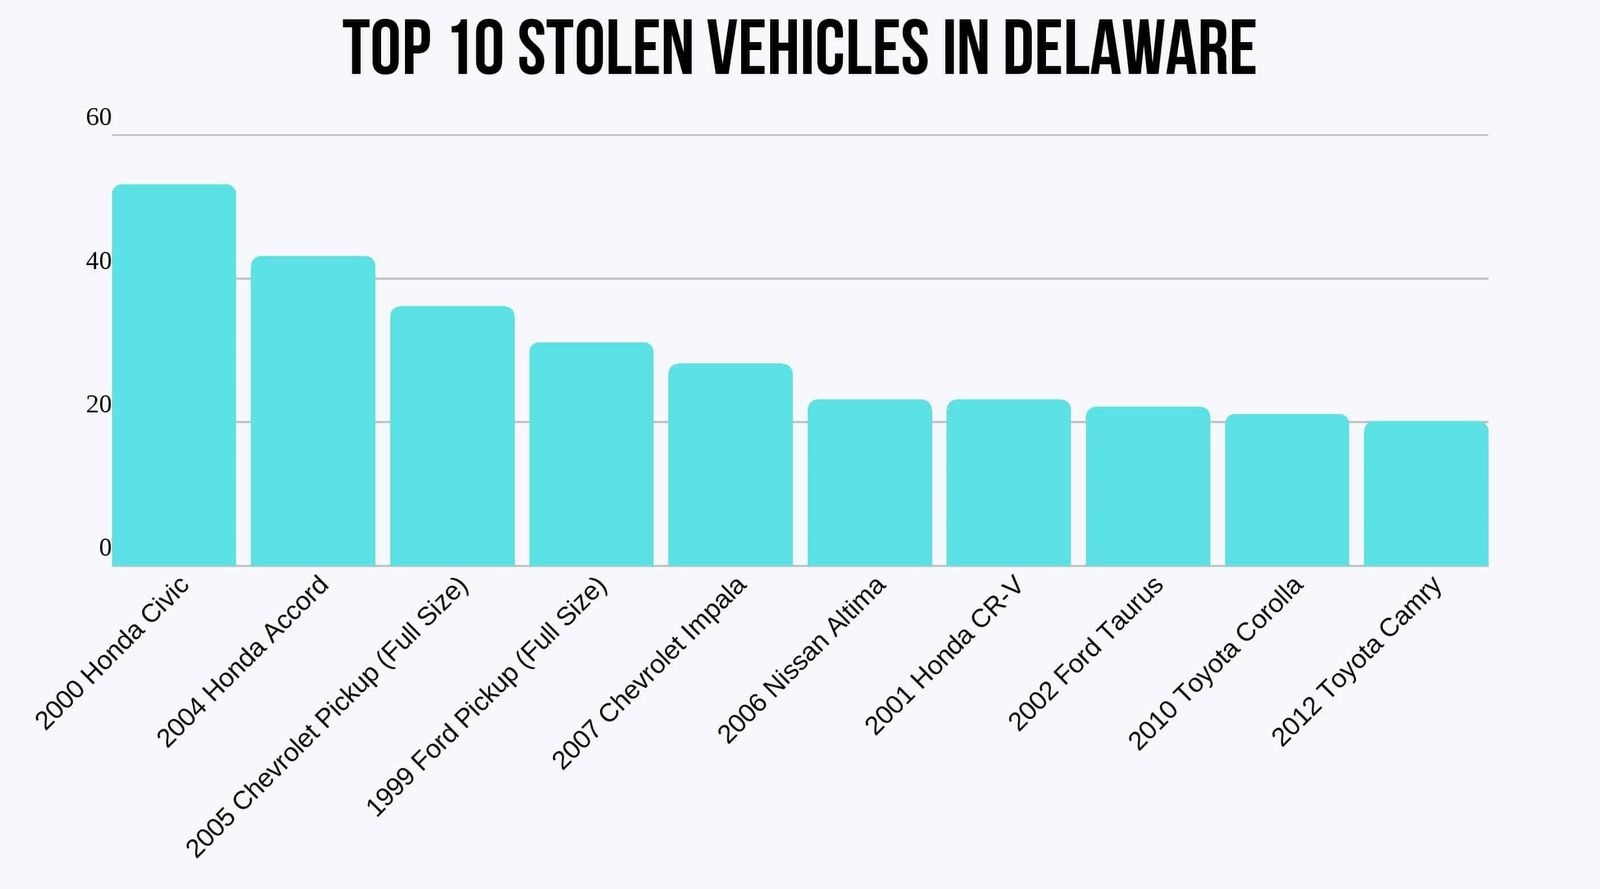 bar chart of the top 10 stolen vehicles in Delaware